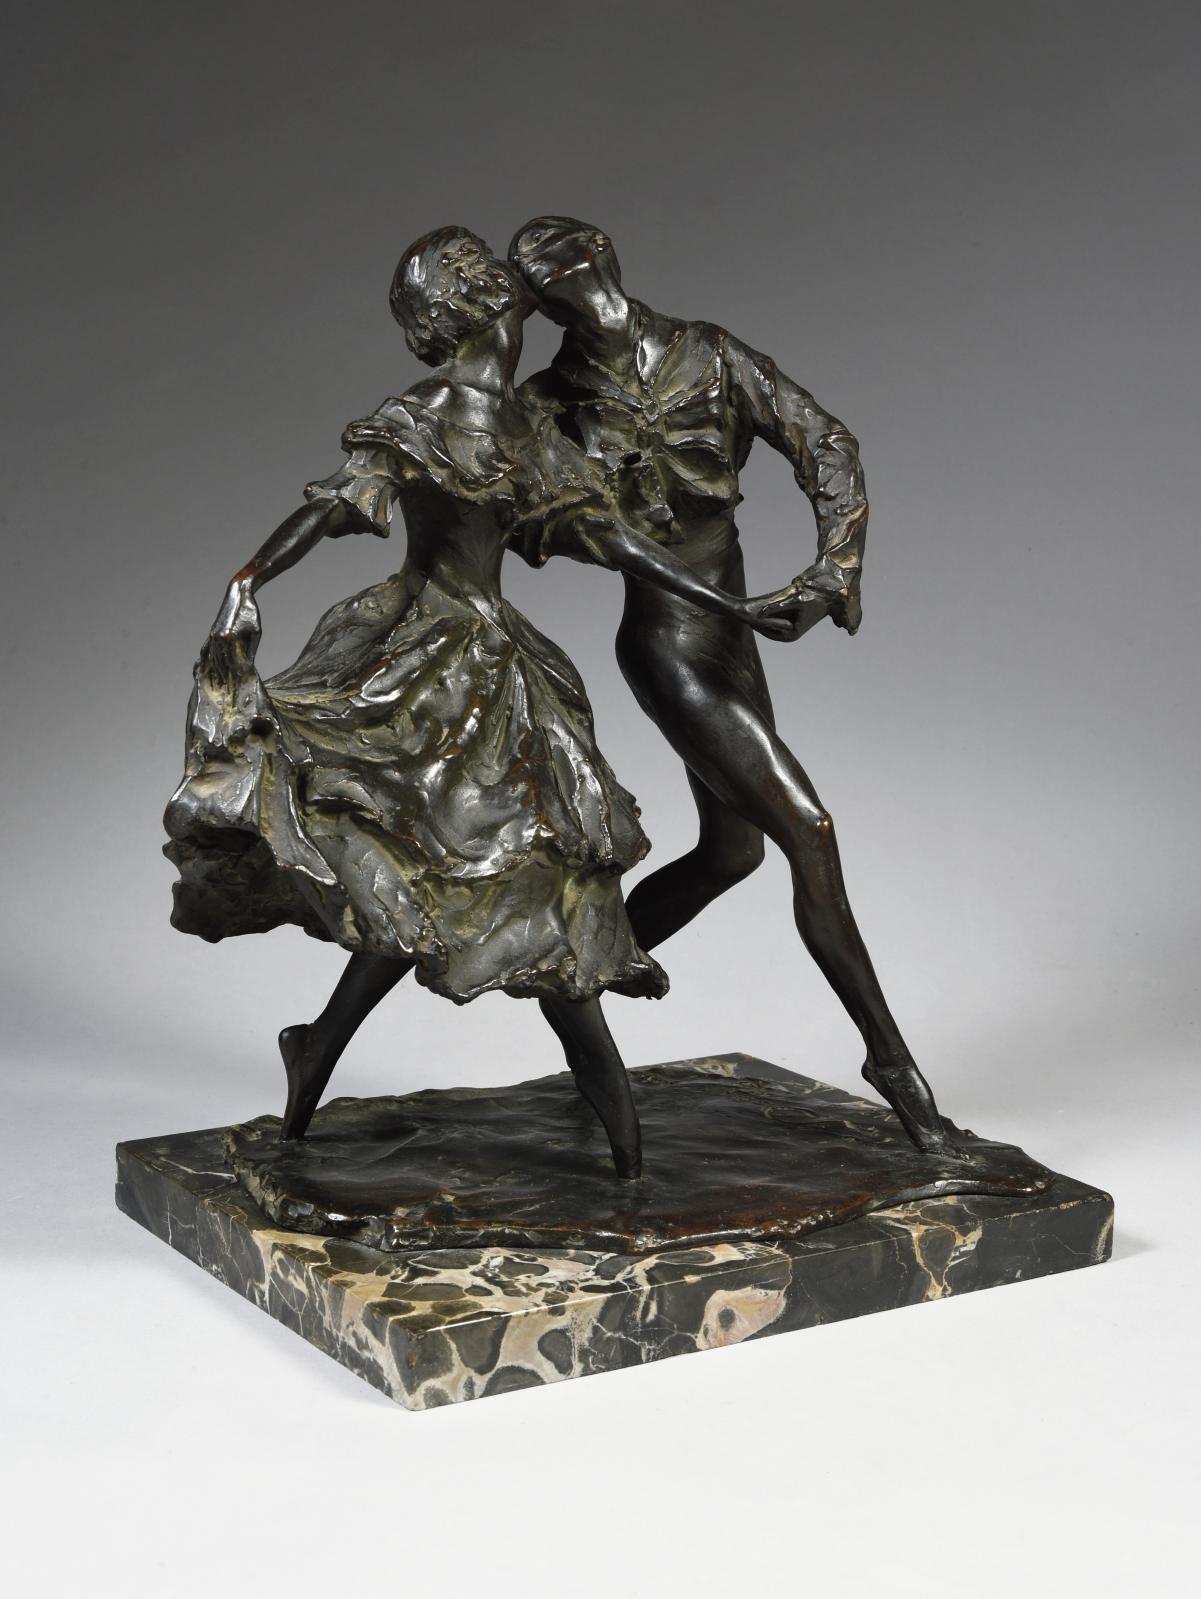 Gleb W. Derujinsky (1888-1975), Vaslav Nijinski et Tamara Karsavina jouant les rôles d'Arlequin et de Colombine dans le ballet «Carnaval»